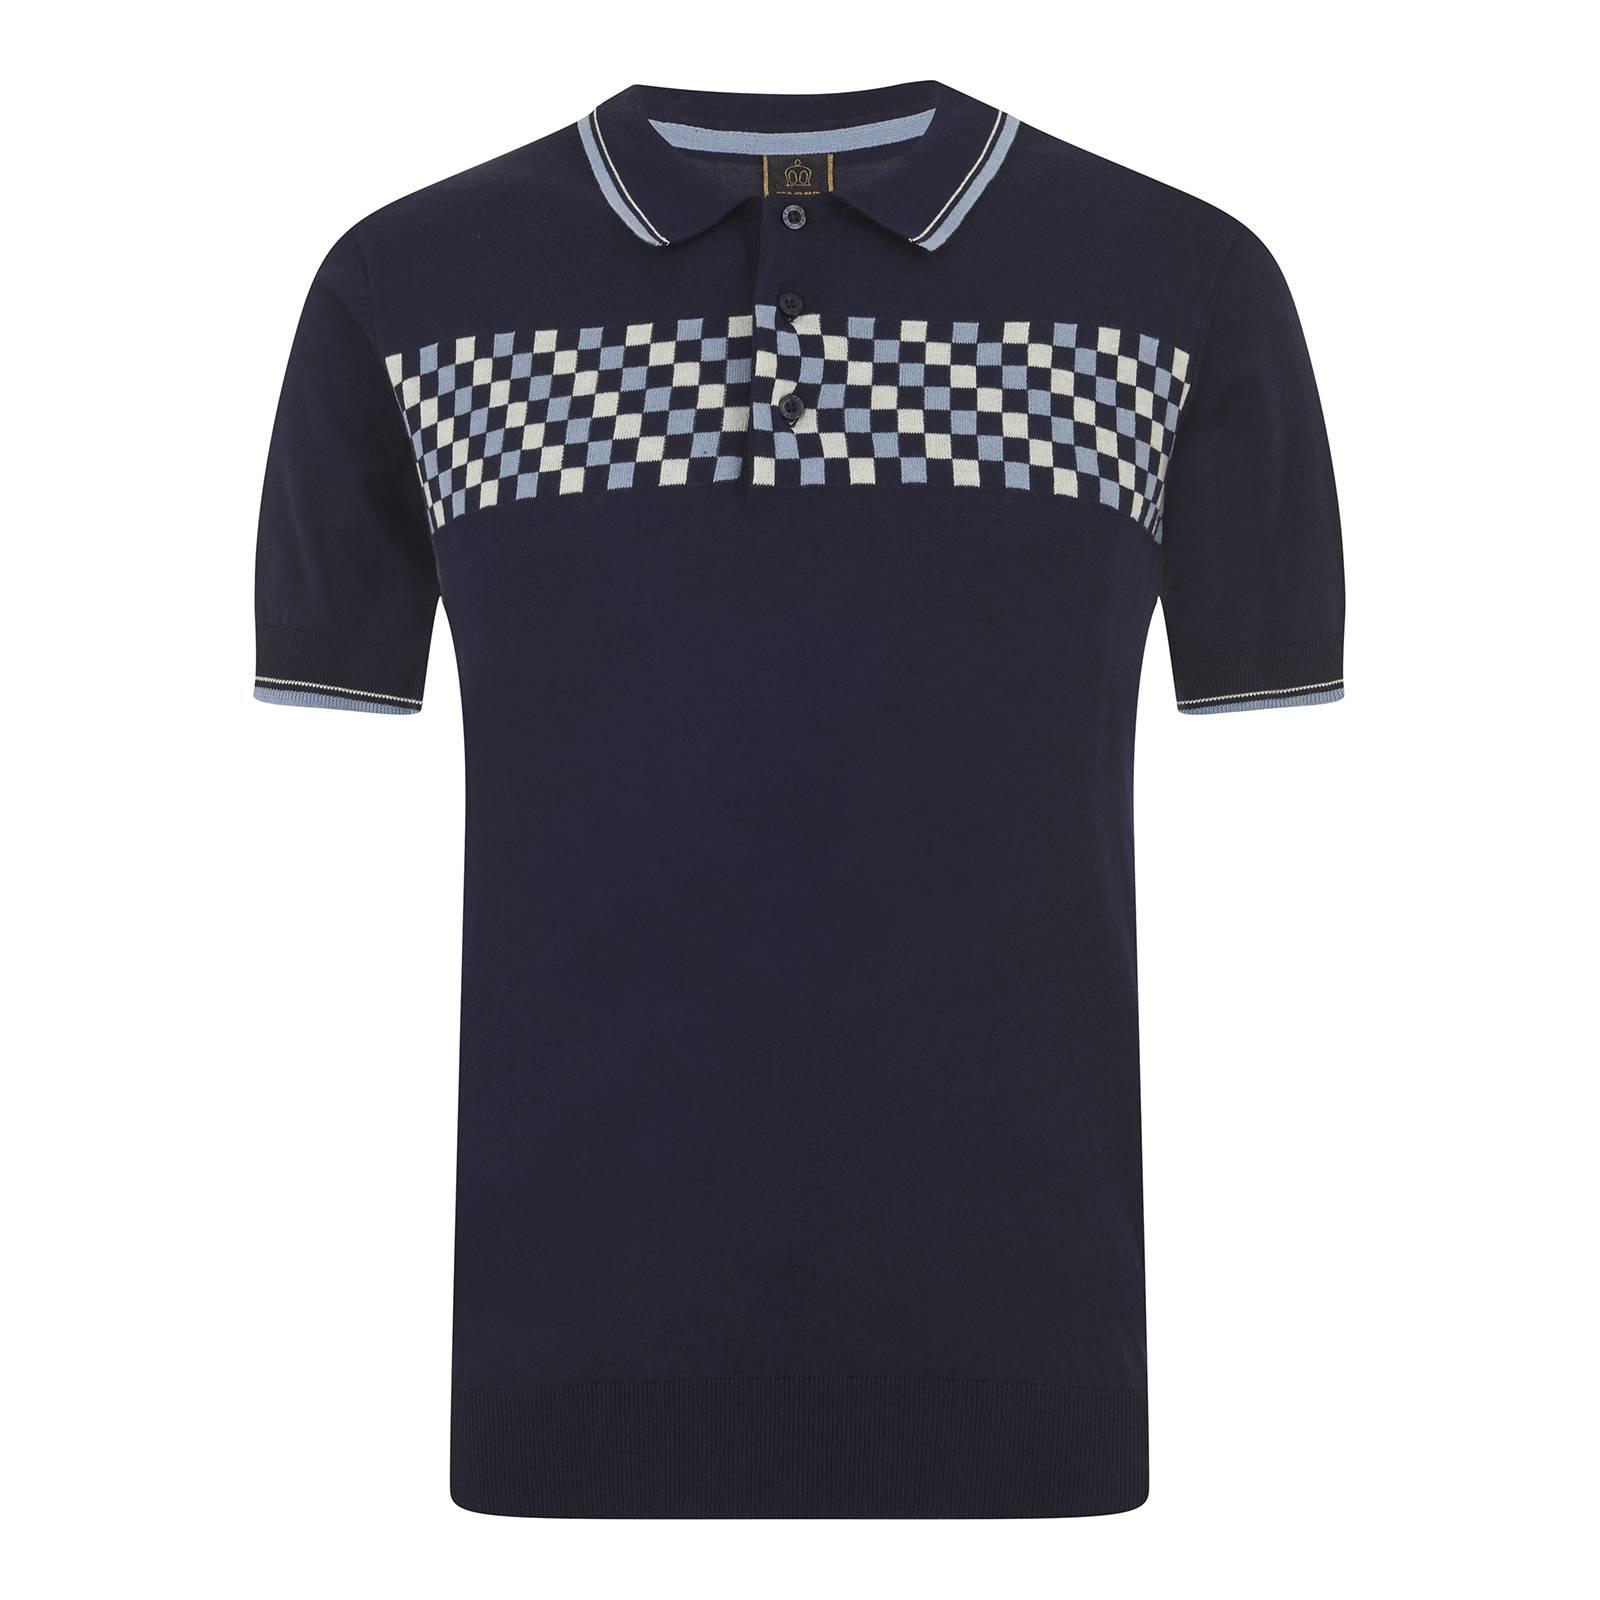 Рубашка Поло IdanПоло<br><br><br>Артикул: 1616103<br>Материал: 100% хлопок<br>Цвет: темно-синий<br>Пол: Мужской